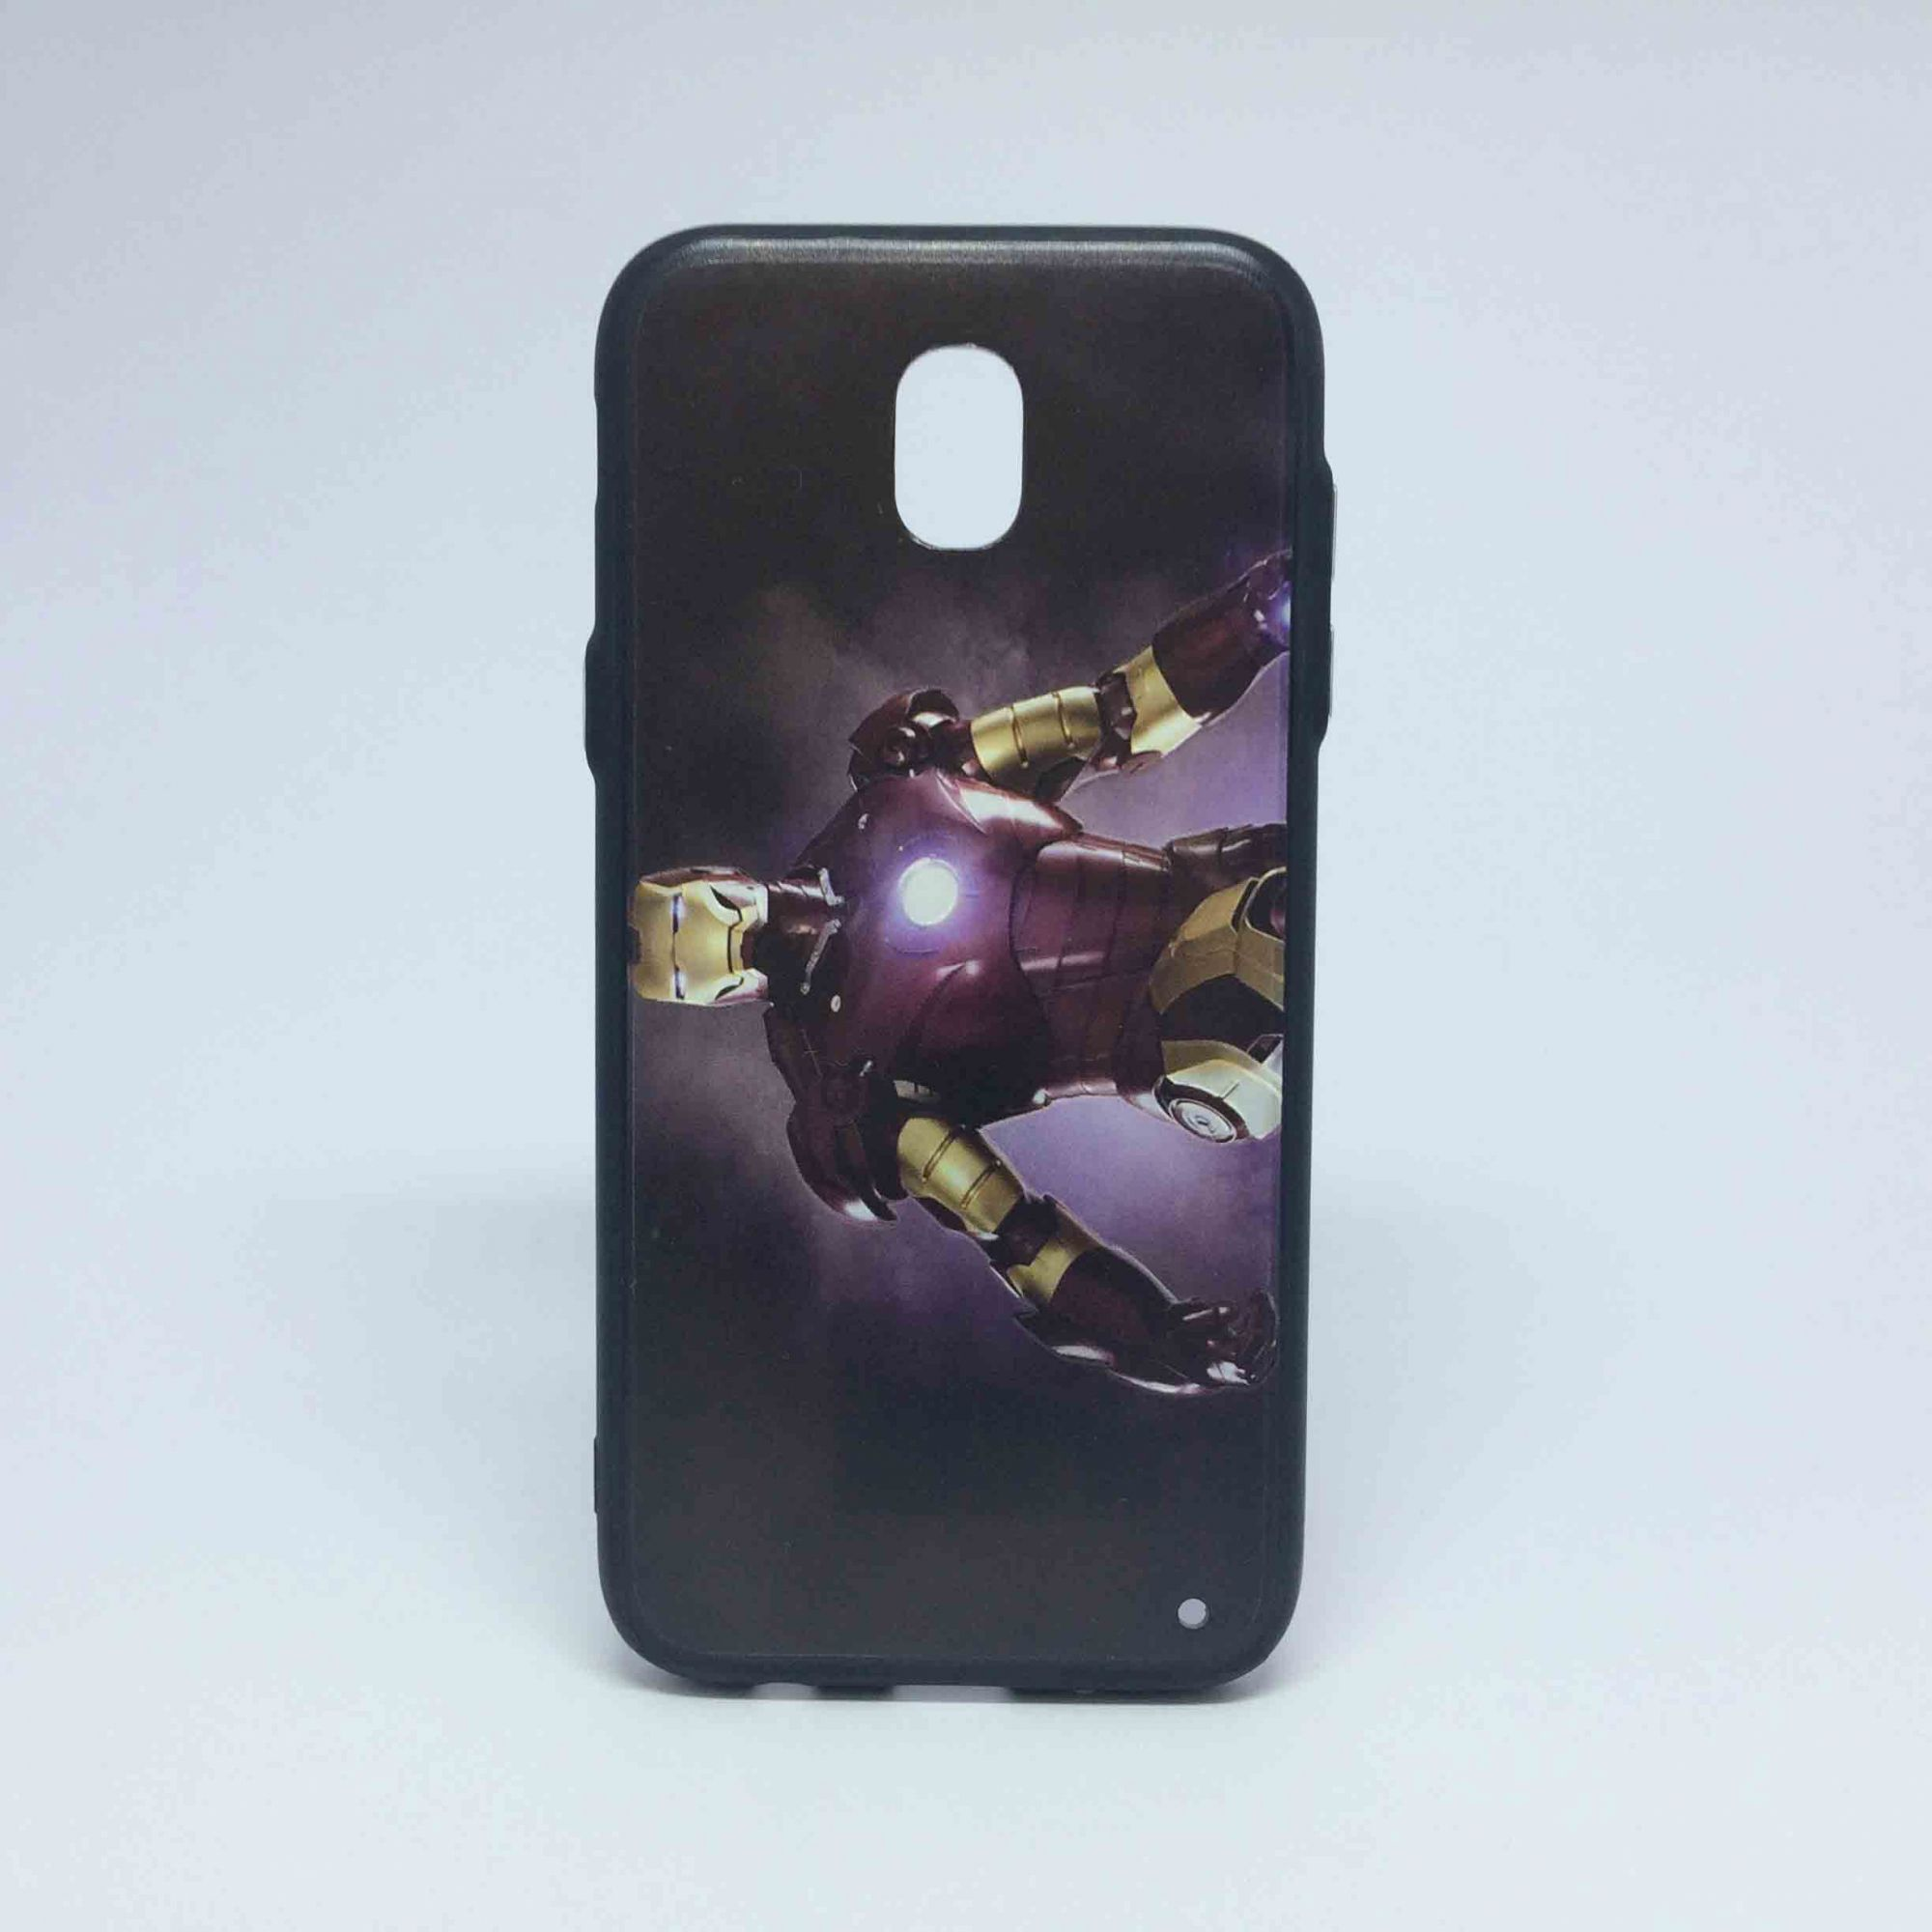 Capa Samsung Galaxy J5 Pro Super - Heróis